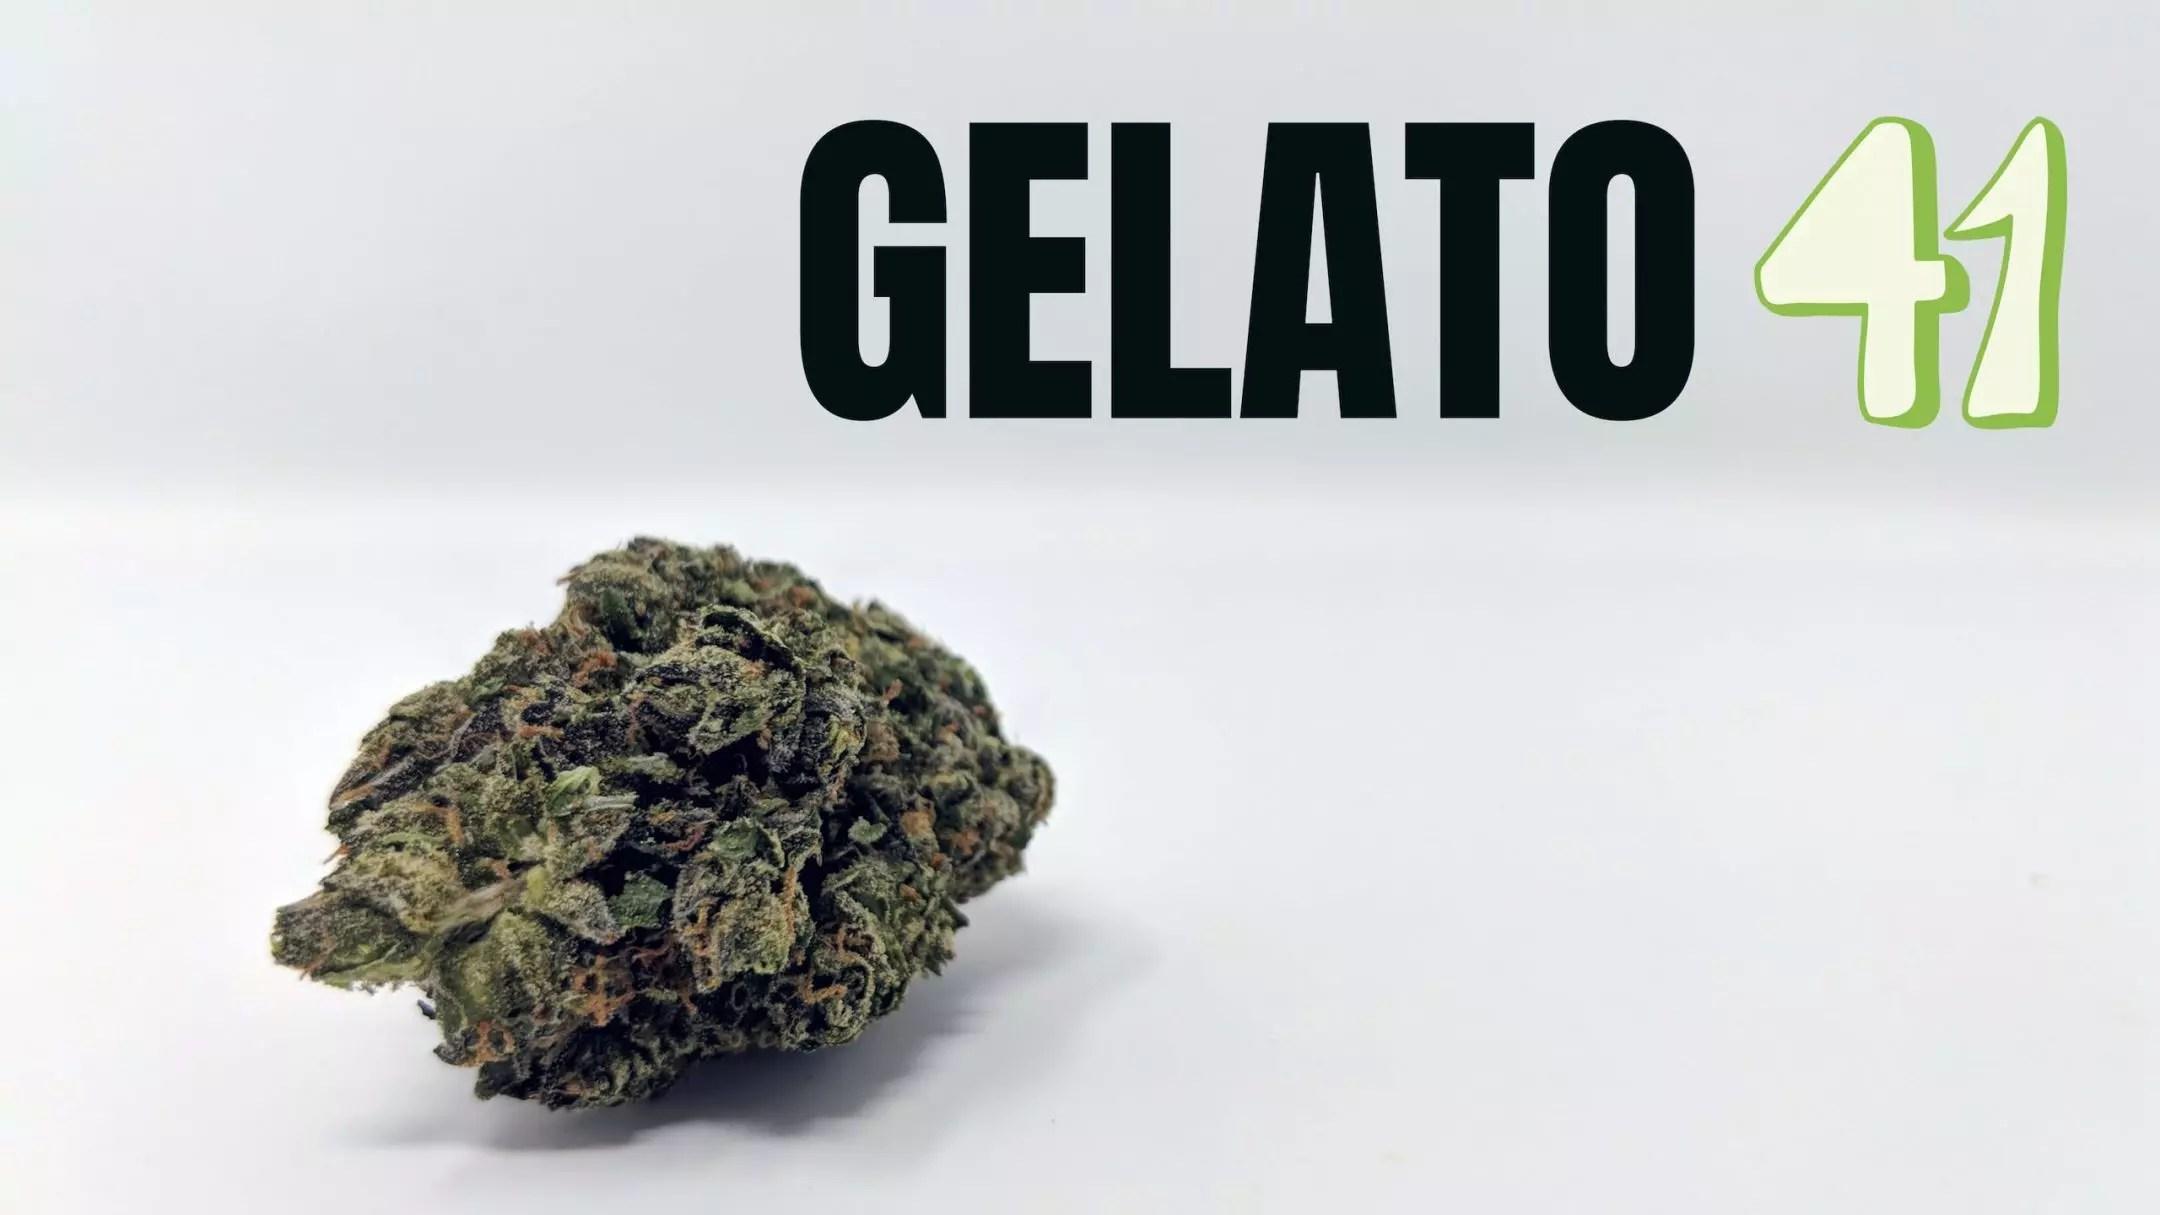 Gelato 41 Cannabis Strain Review & Information - ISMOKE